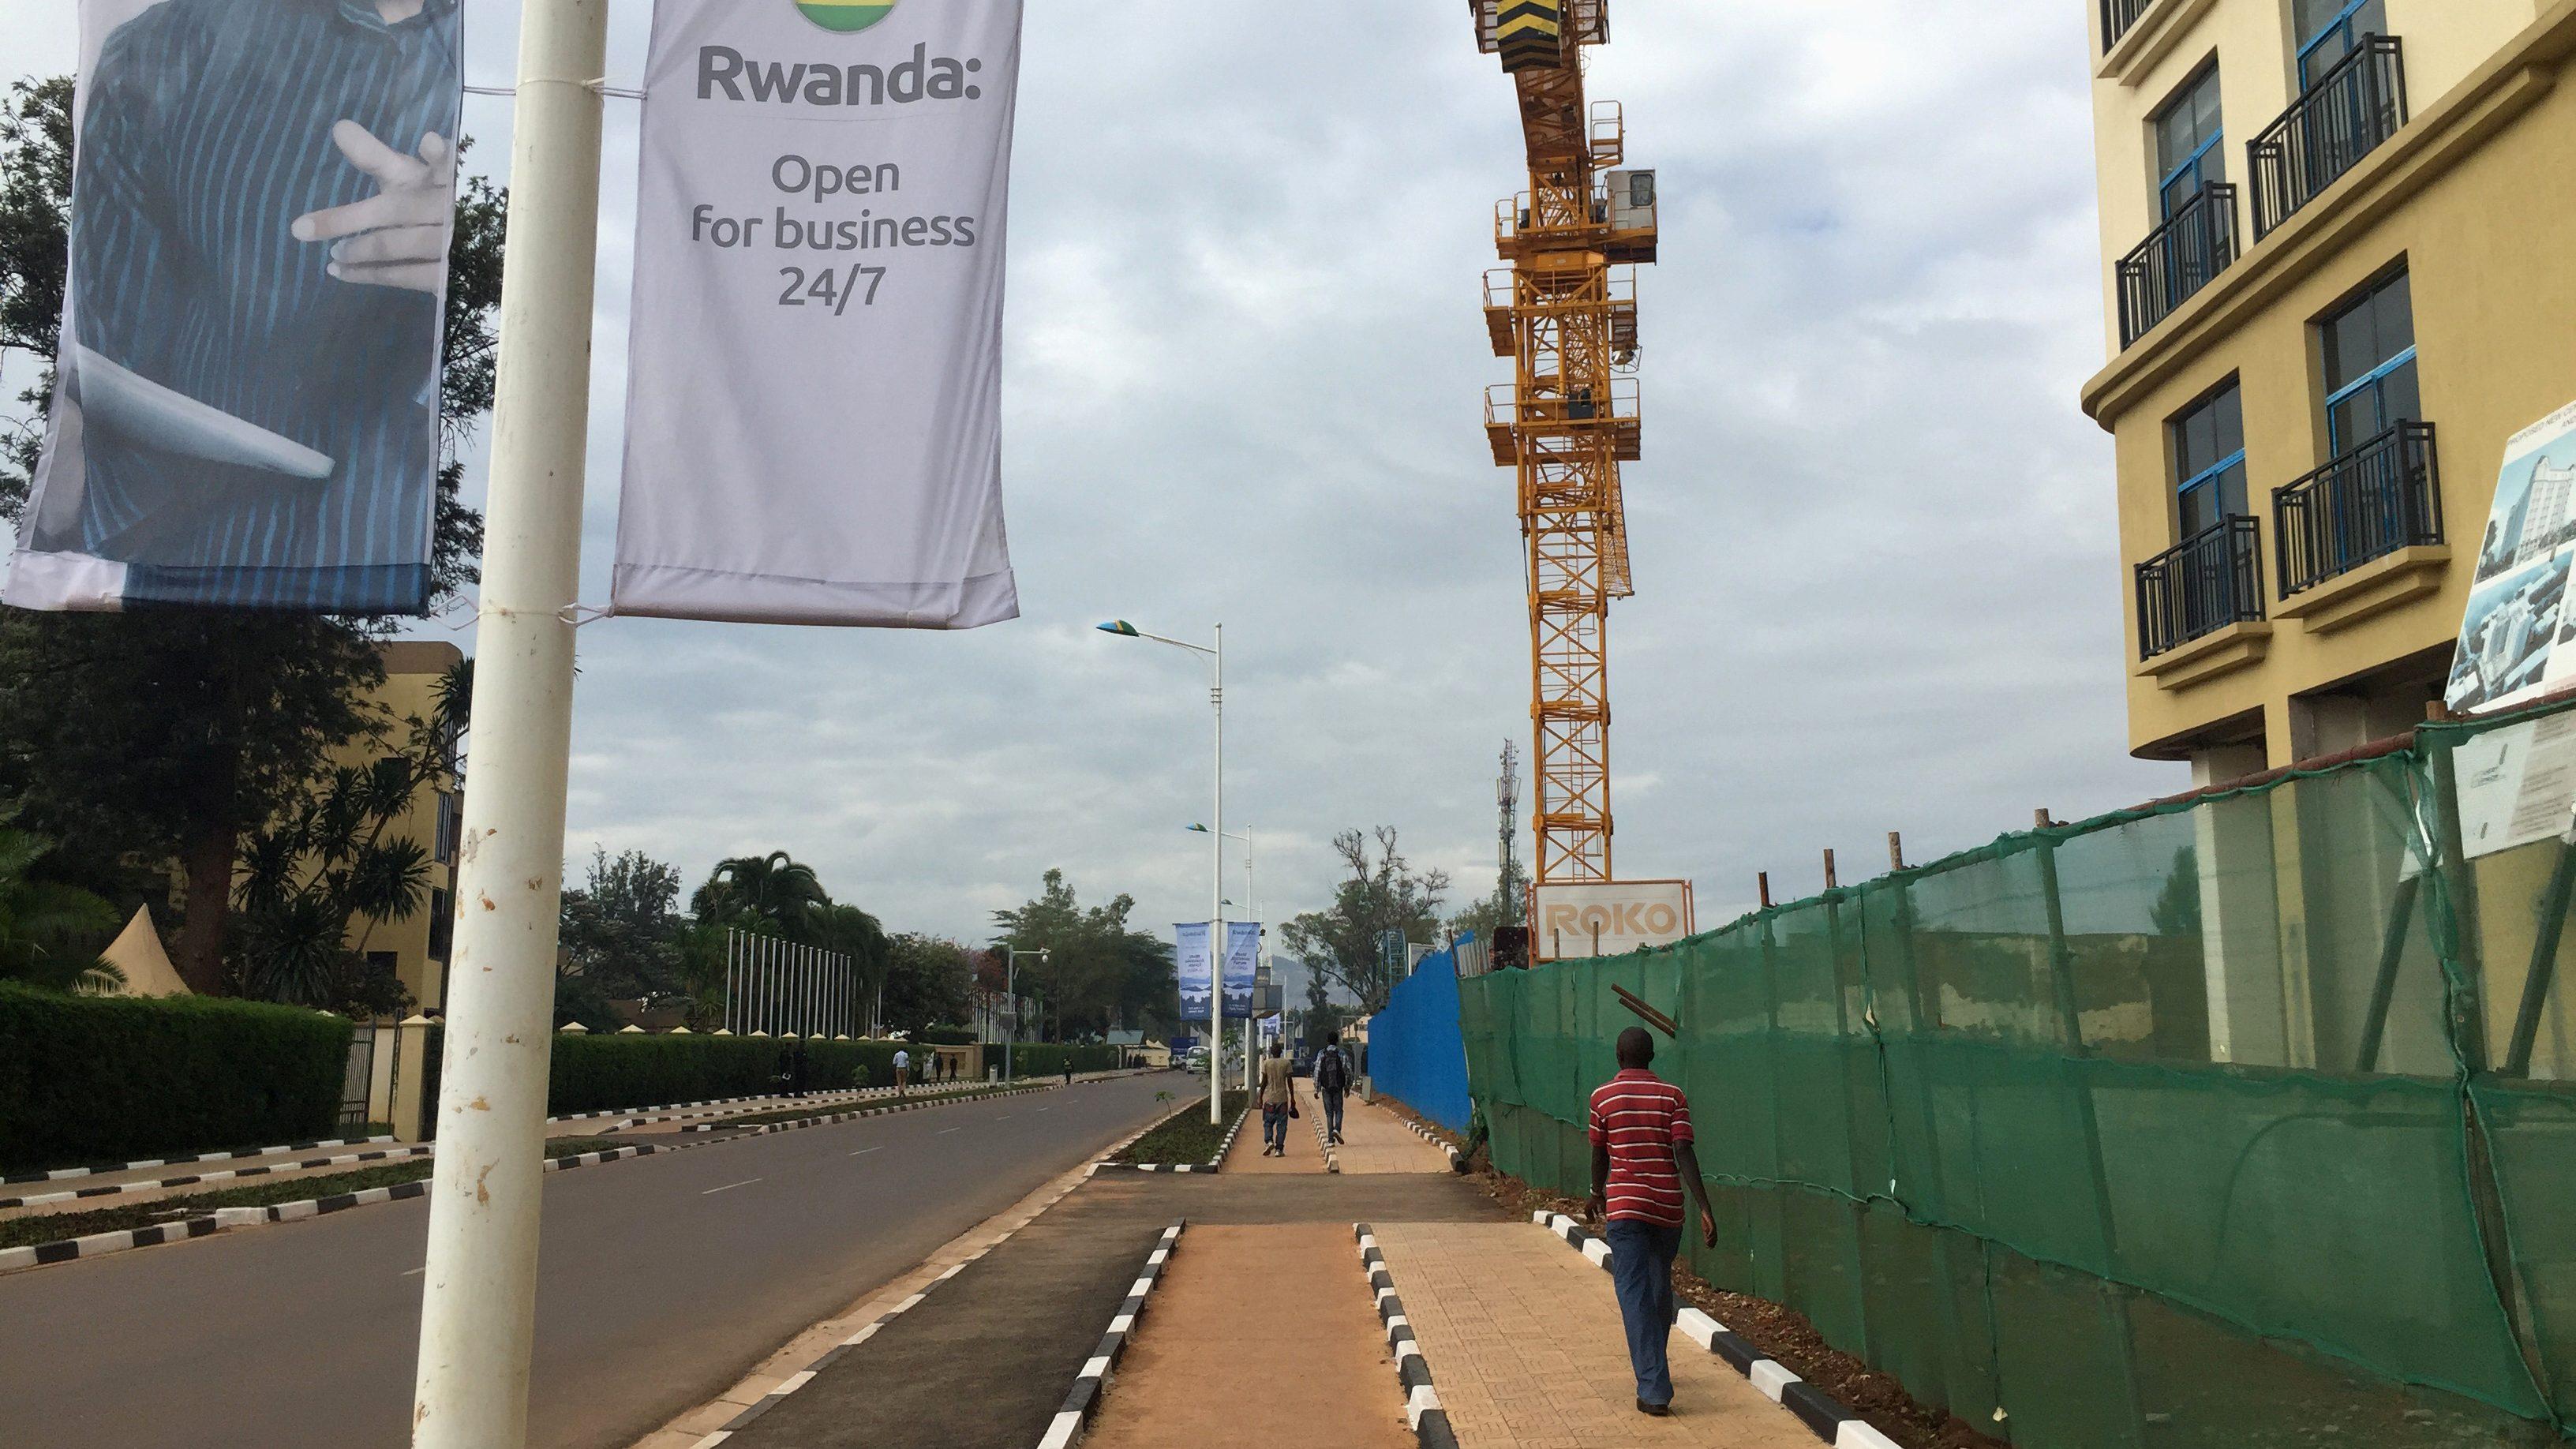 A man walks along a street in Rwanda's capital, Kigali in 2016